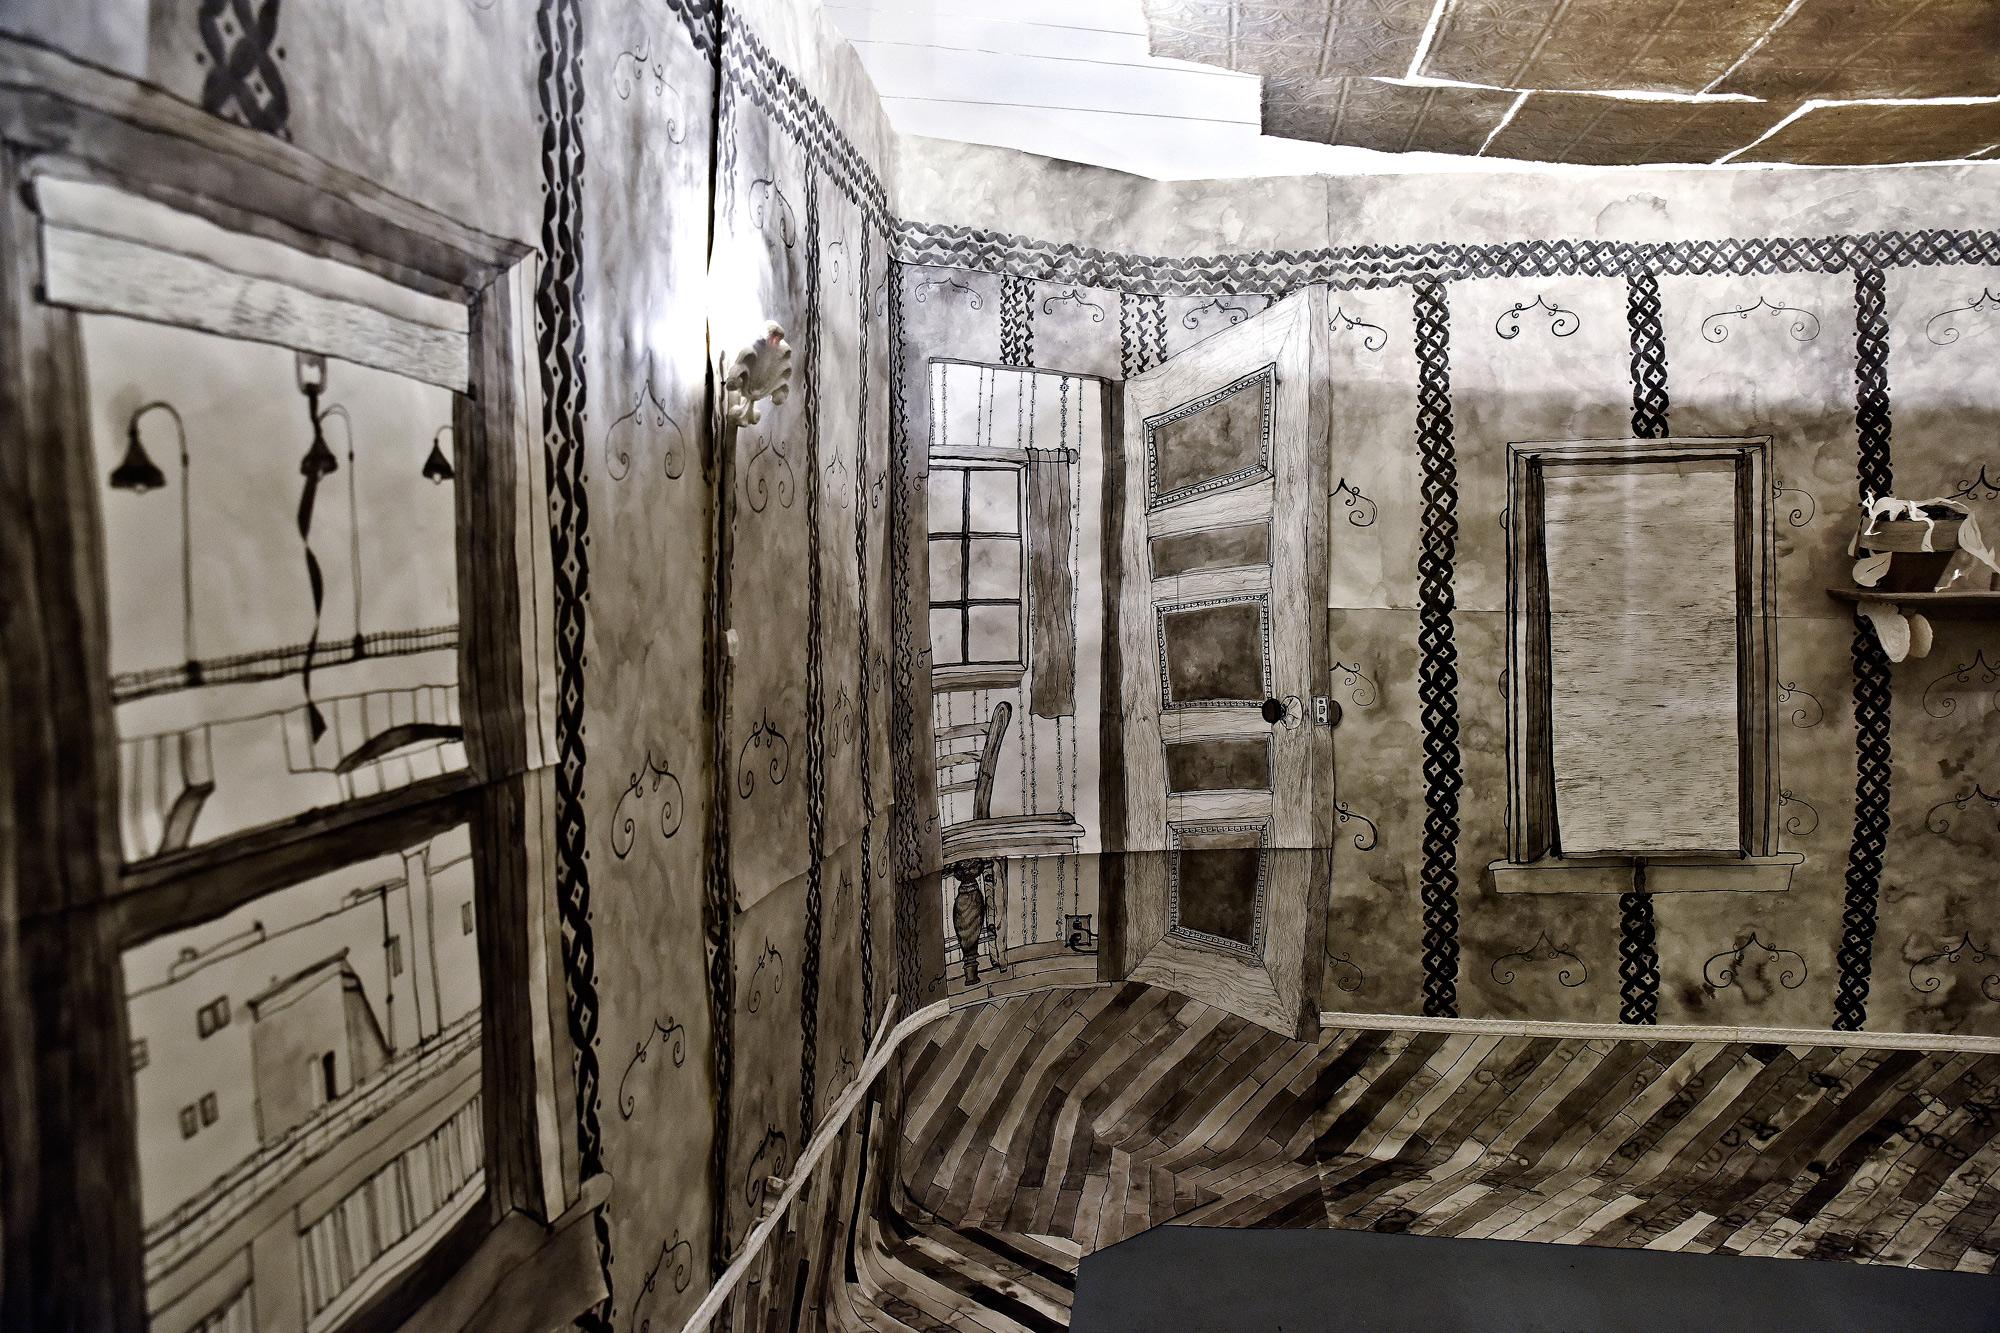 Retrofit , installation view. Paper, ink, wire, nails, light bulbs & fixtures, gel medium. 2015.